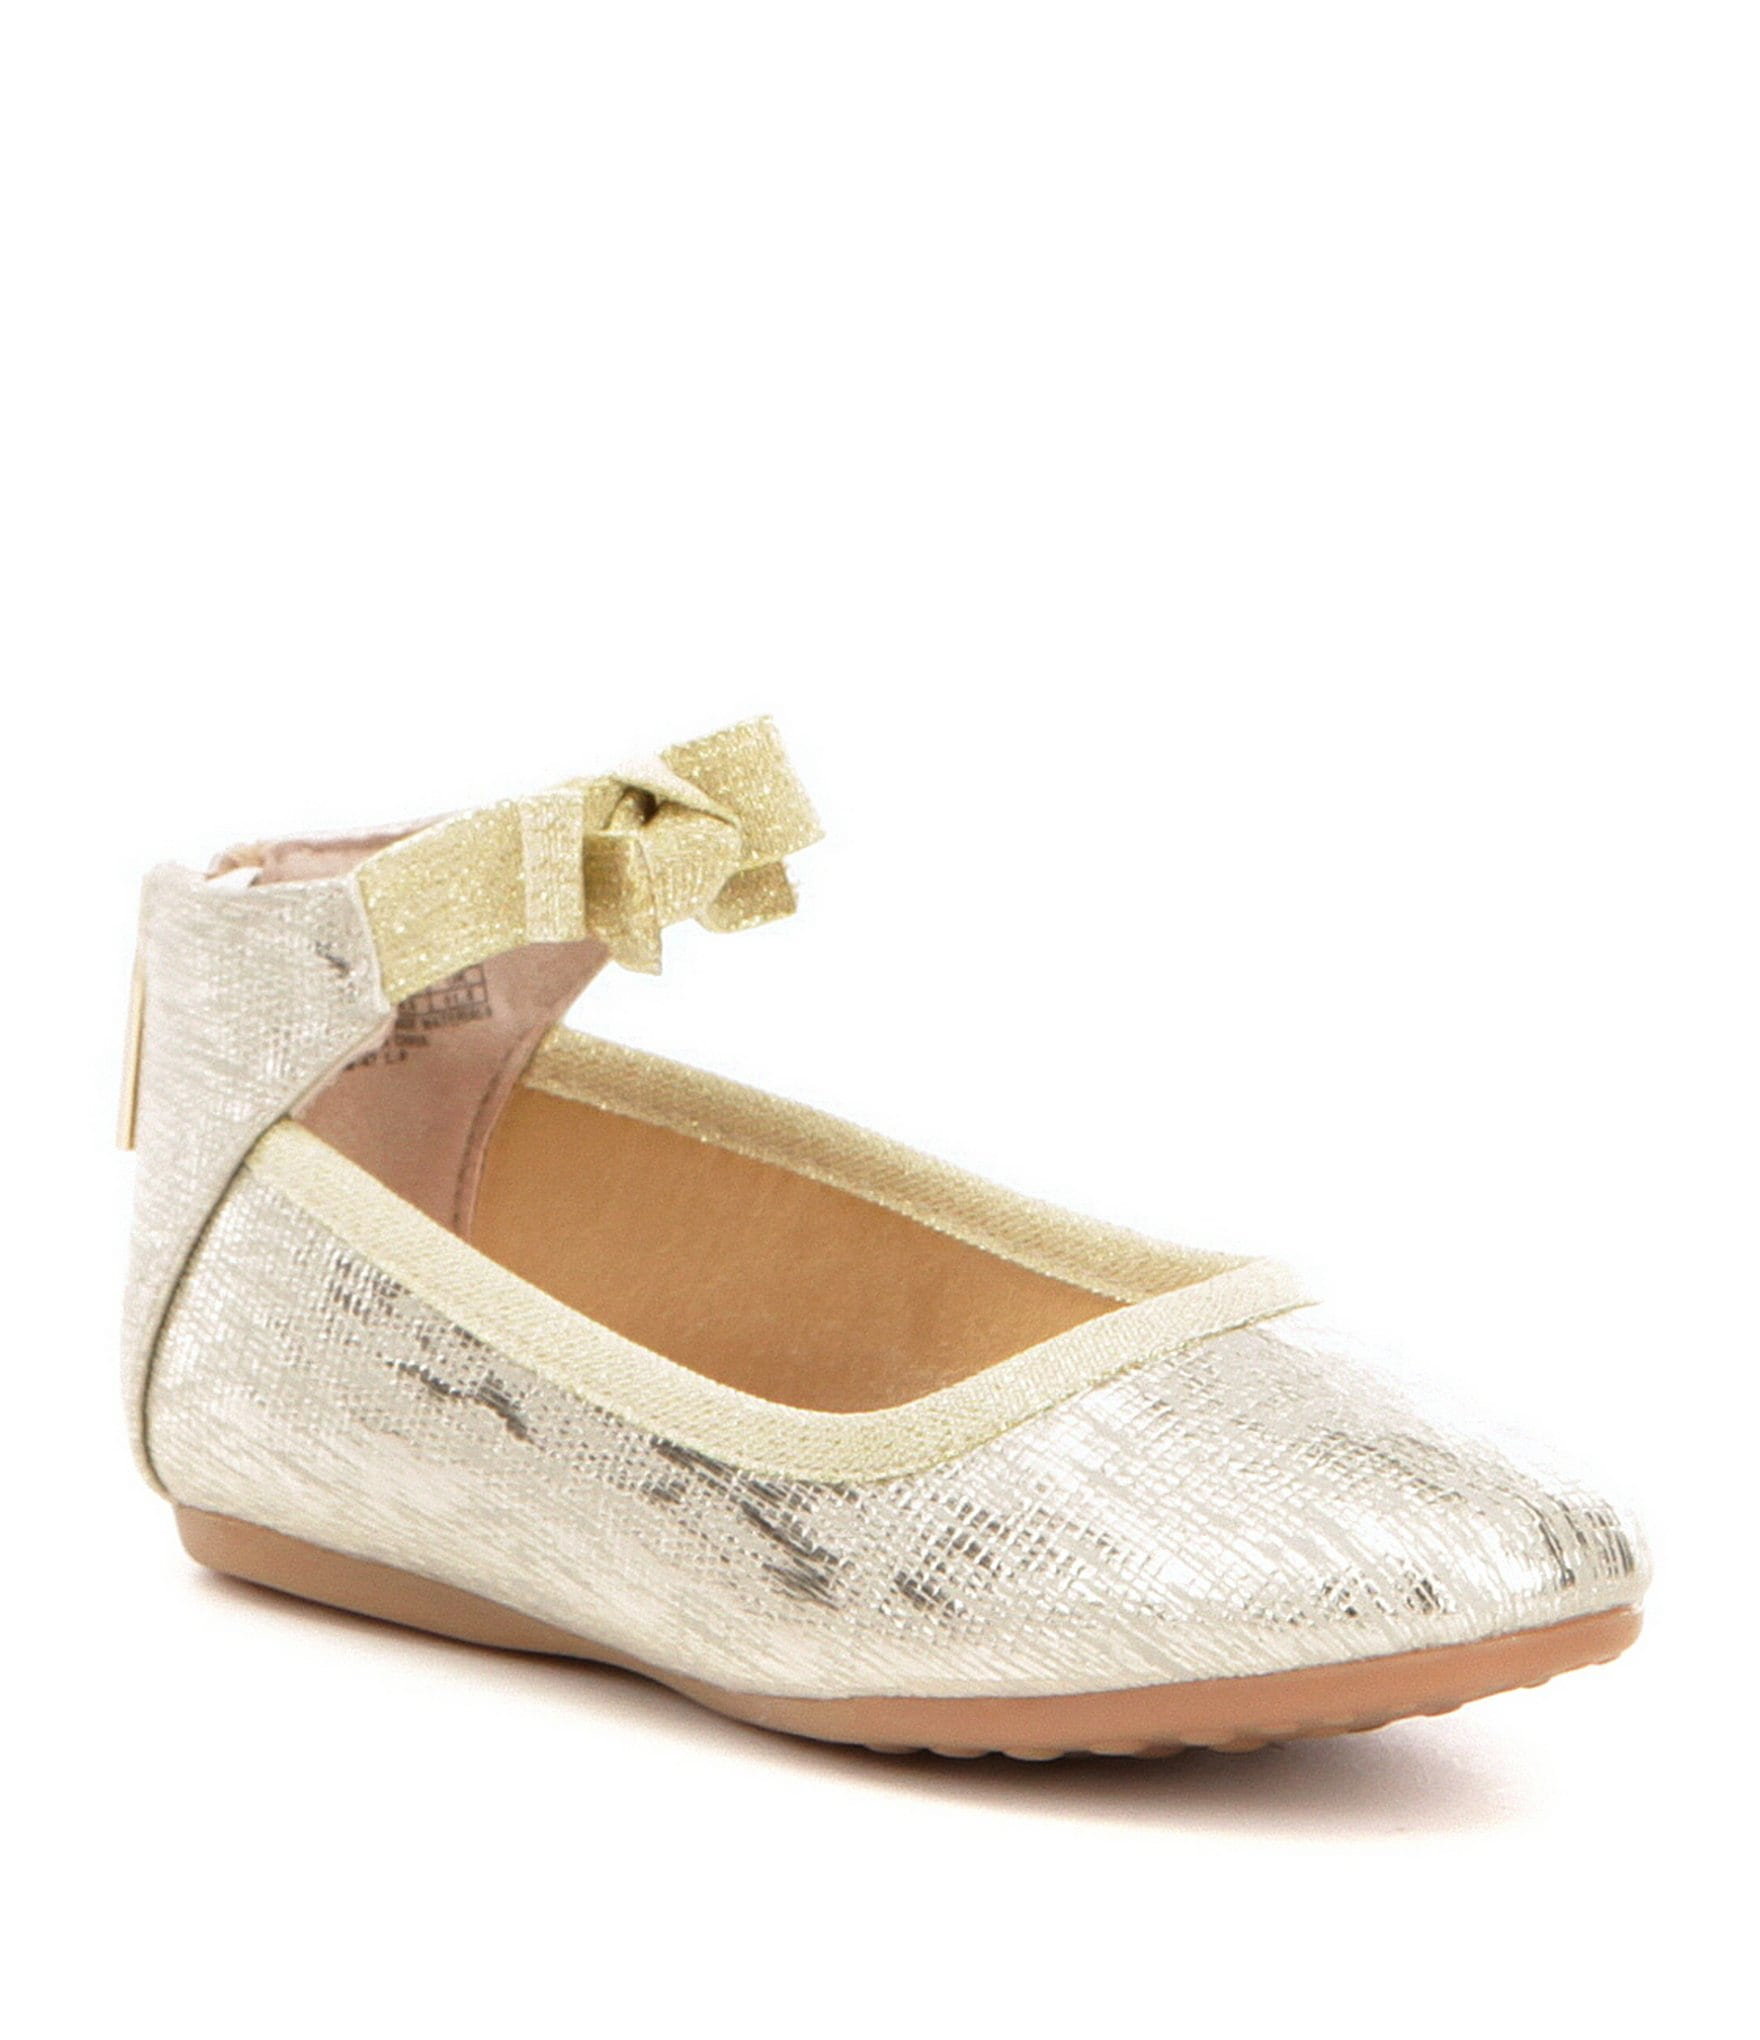 Flat rhinestone sandals for wedding - Shoes Kids Shoes Youth Girls 12 5 Dress Shoes Flat Dillards Com